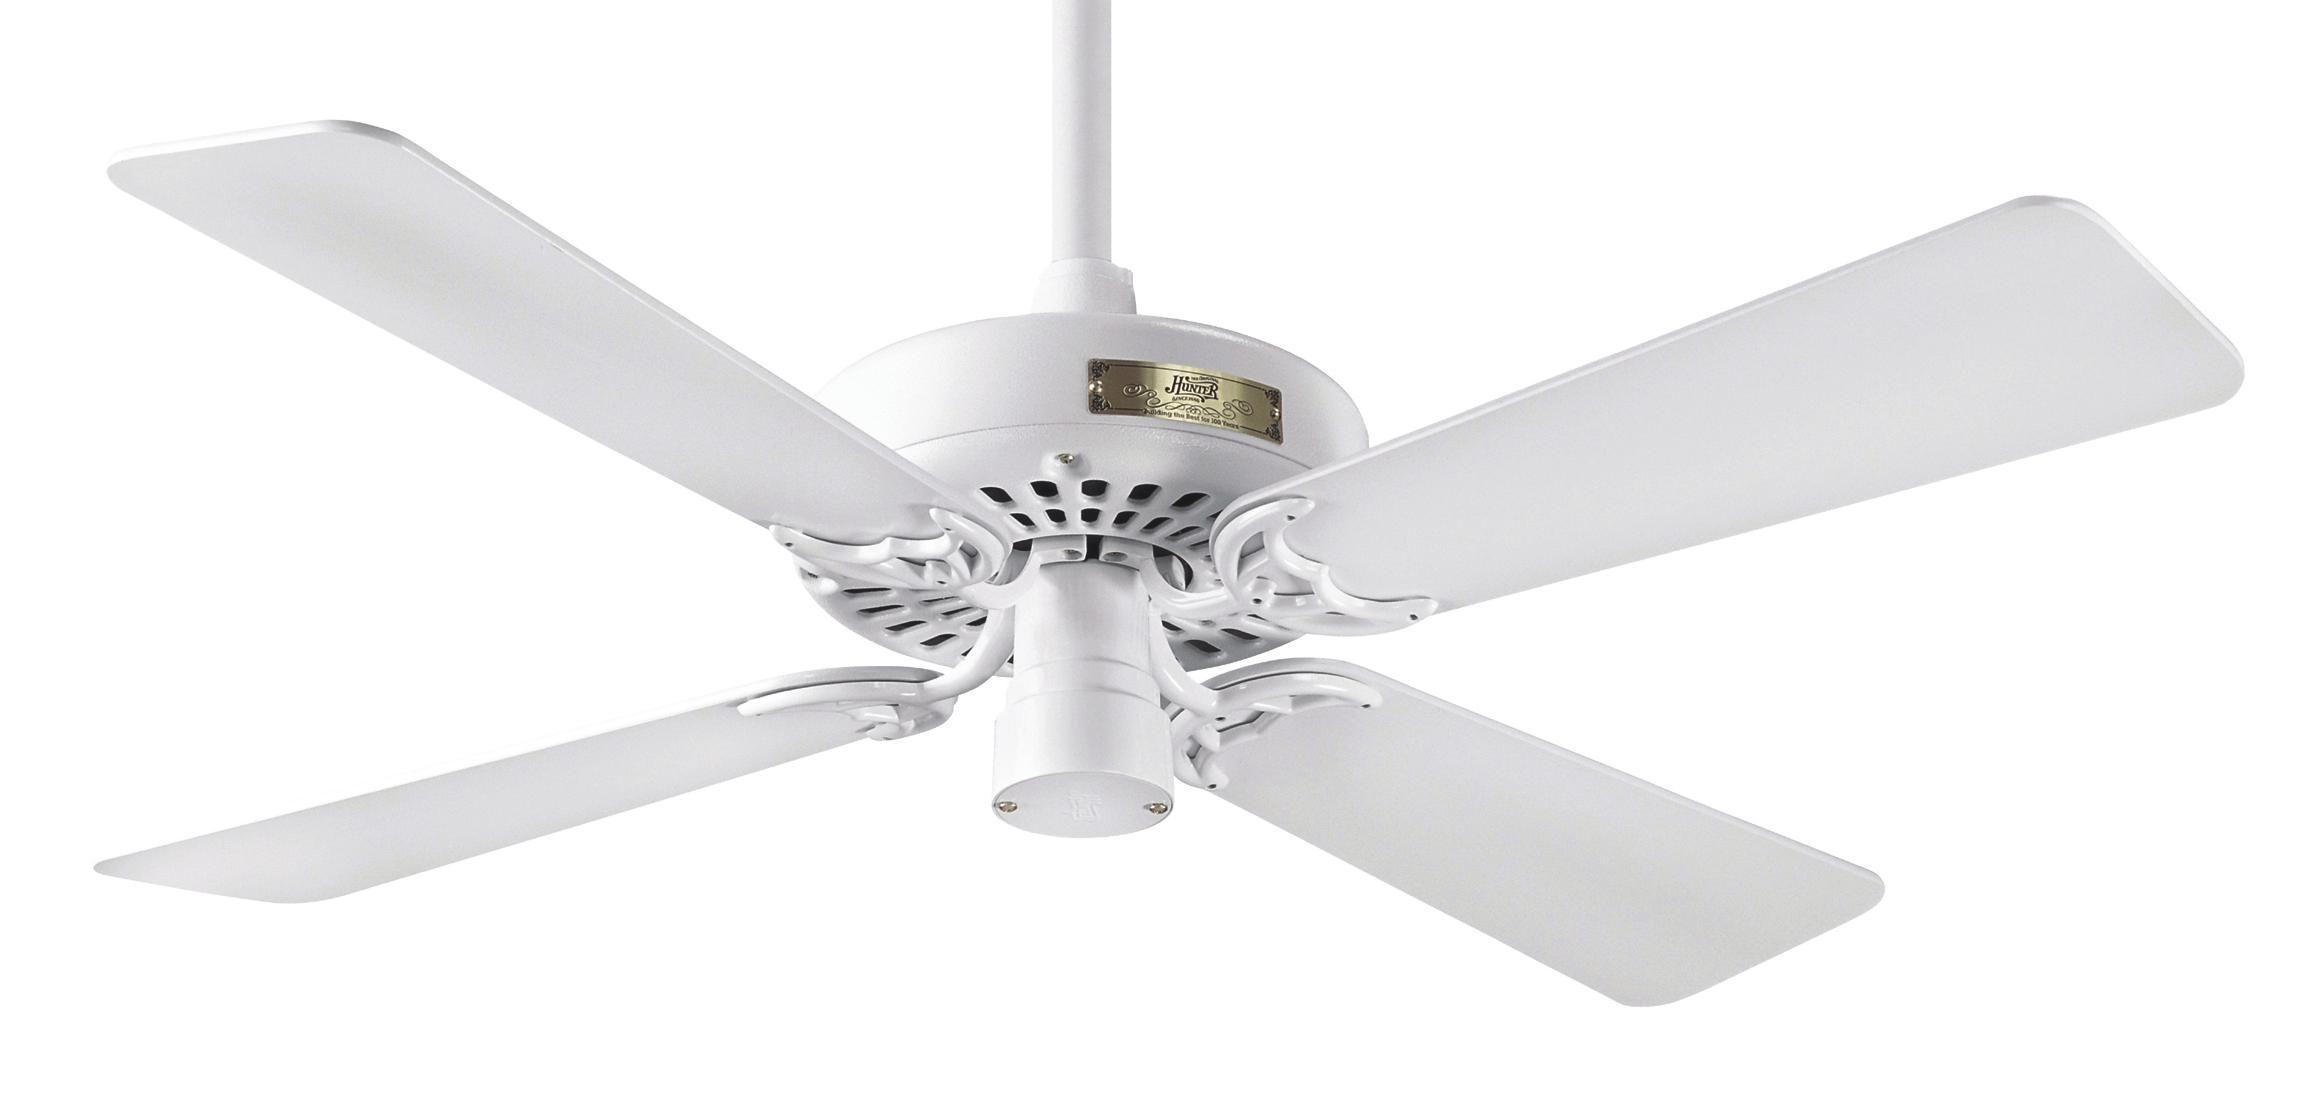 Hunter fan white 42 httponlinecompliancefo pinterest ceiling hunter fan white 42 aloadofball Image collections